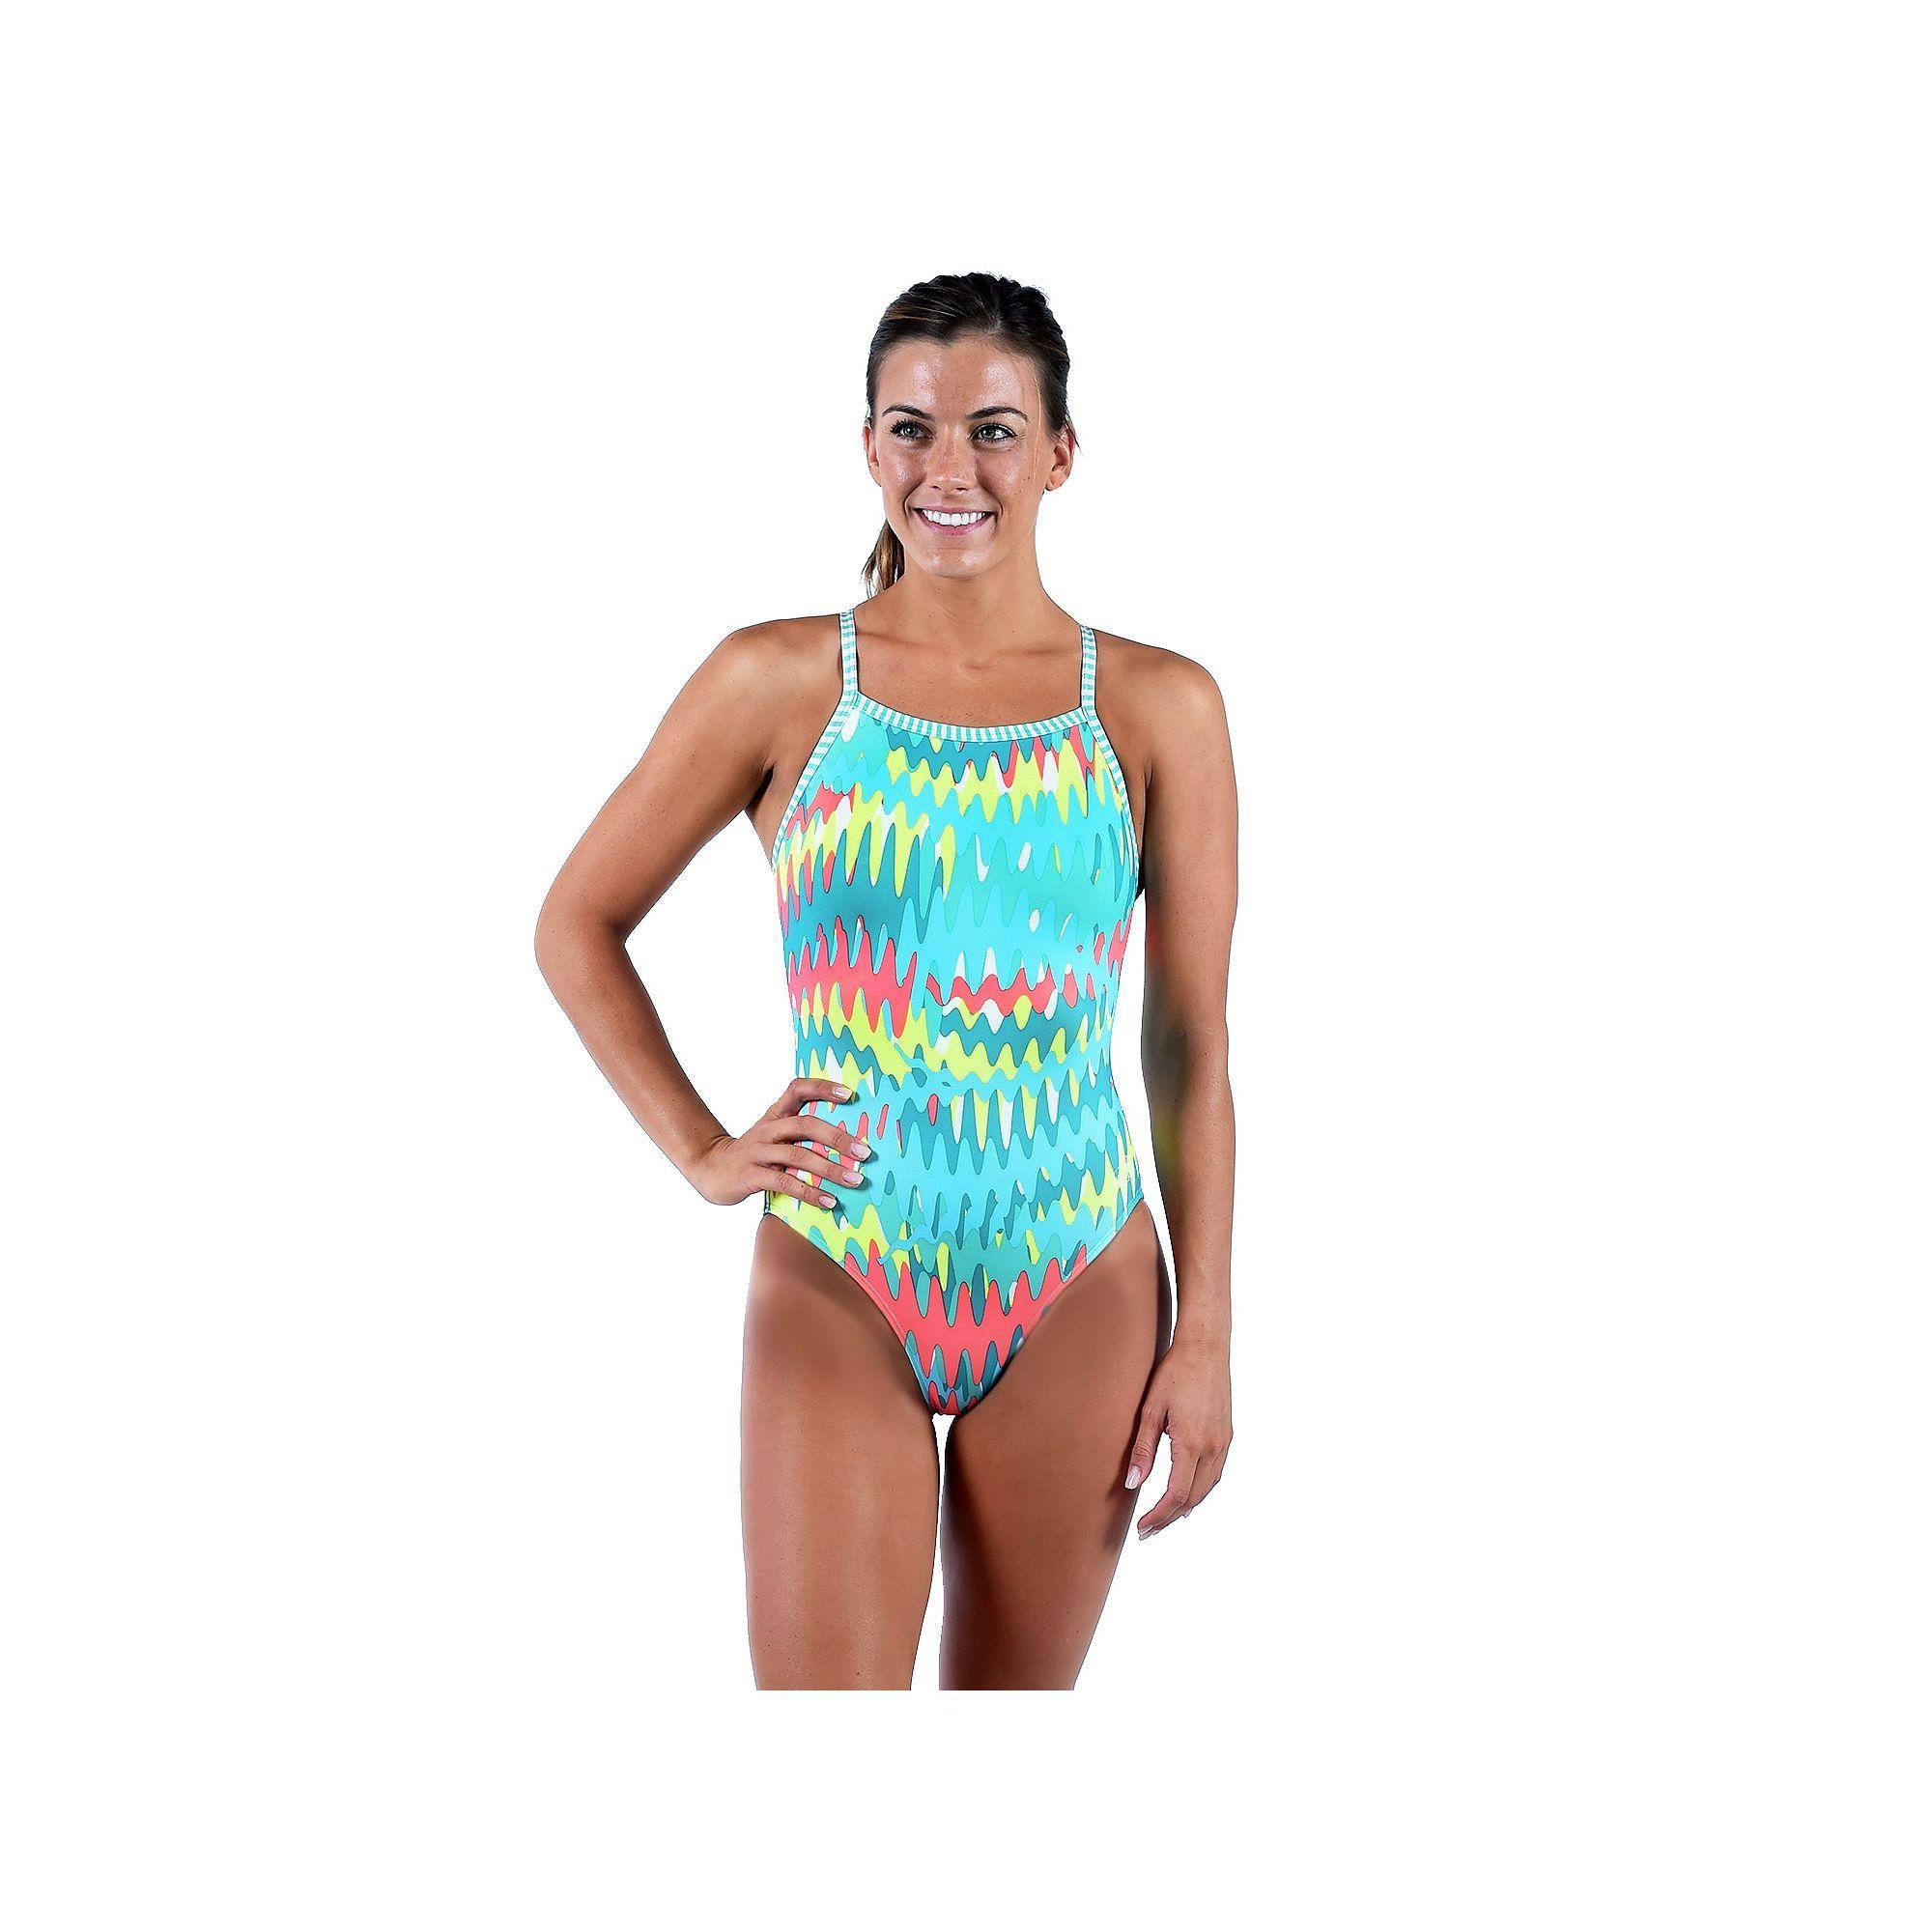 4fd1e2b40f2 Women's Dolfin Uglies V-2 Printed One-Piece Swimsuit, Size: 38 Comp, Light  Pink